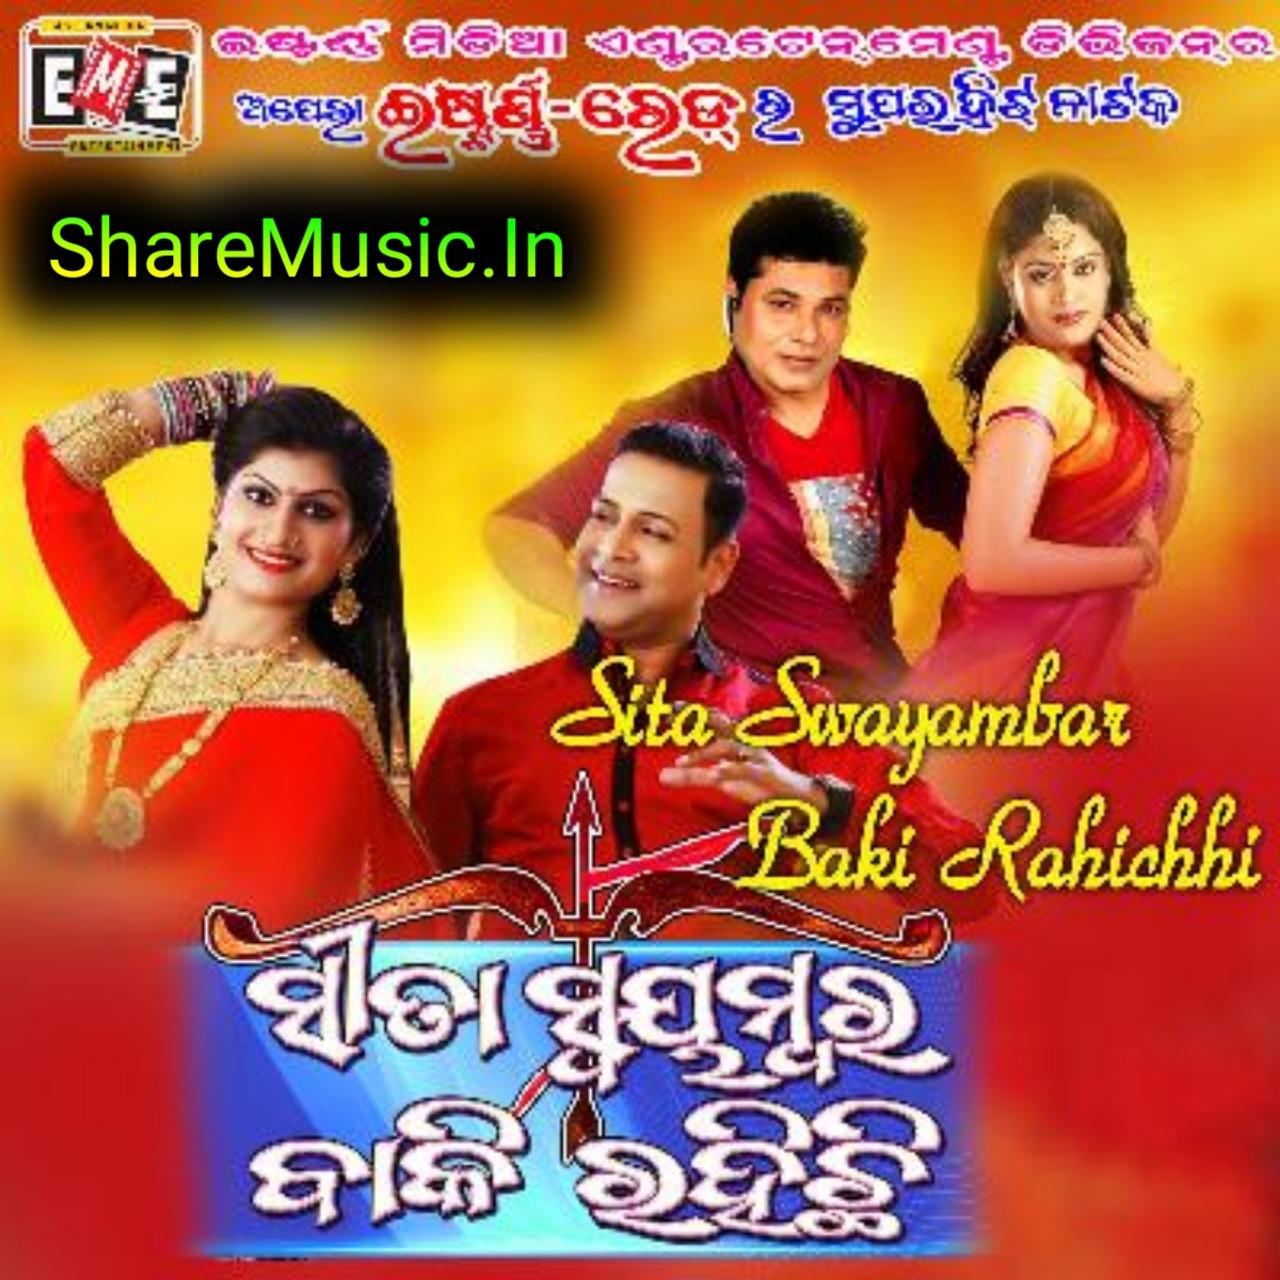 Sita Swayambar Baki Rahichi (Humane Sagar, Ira Mohanty)